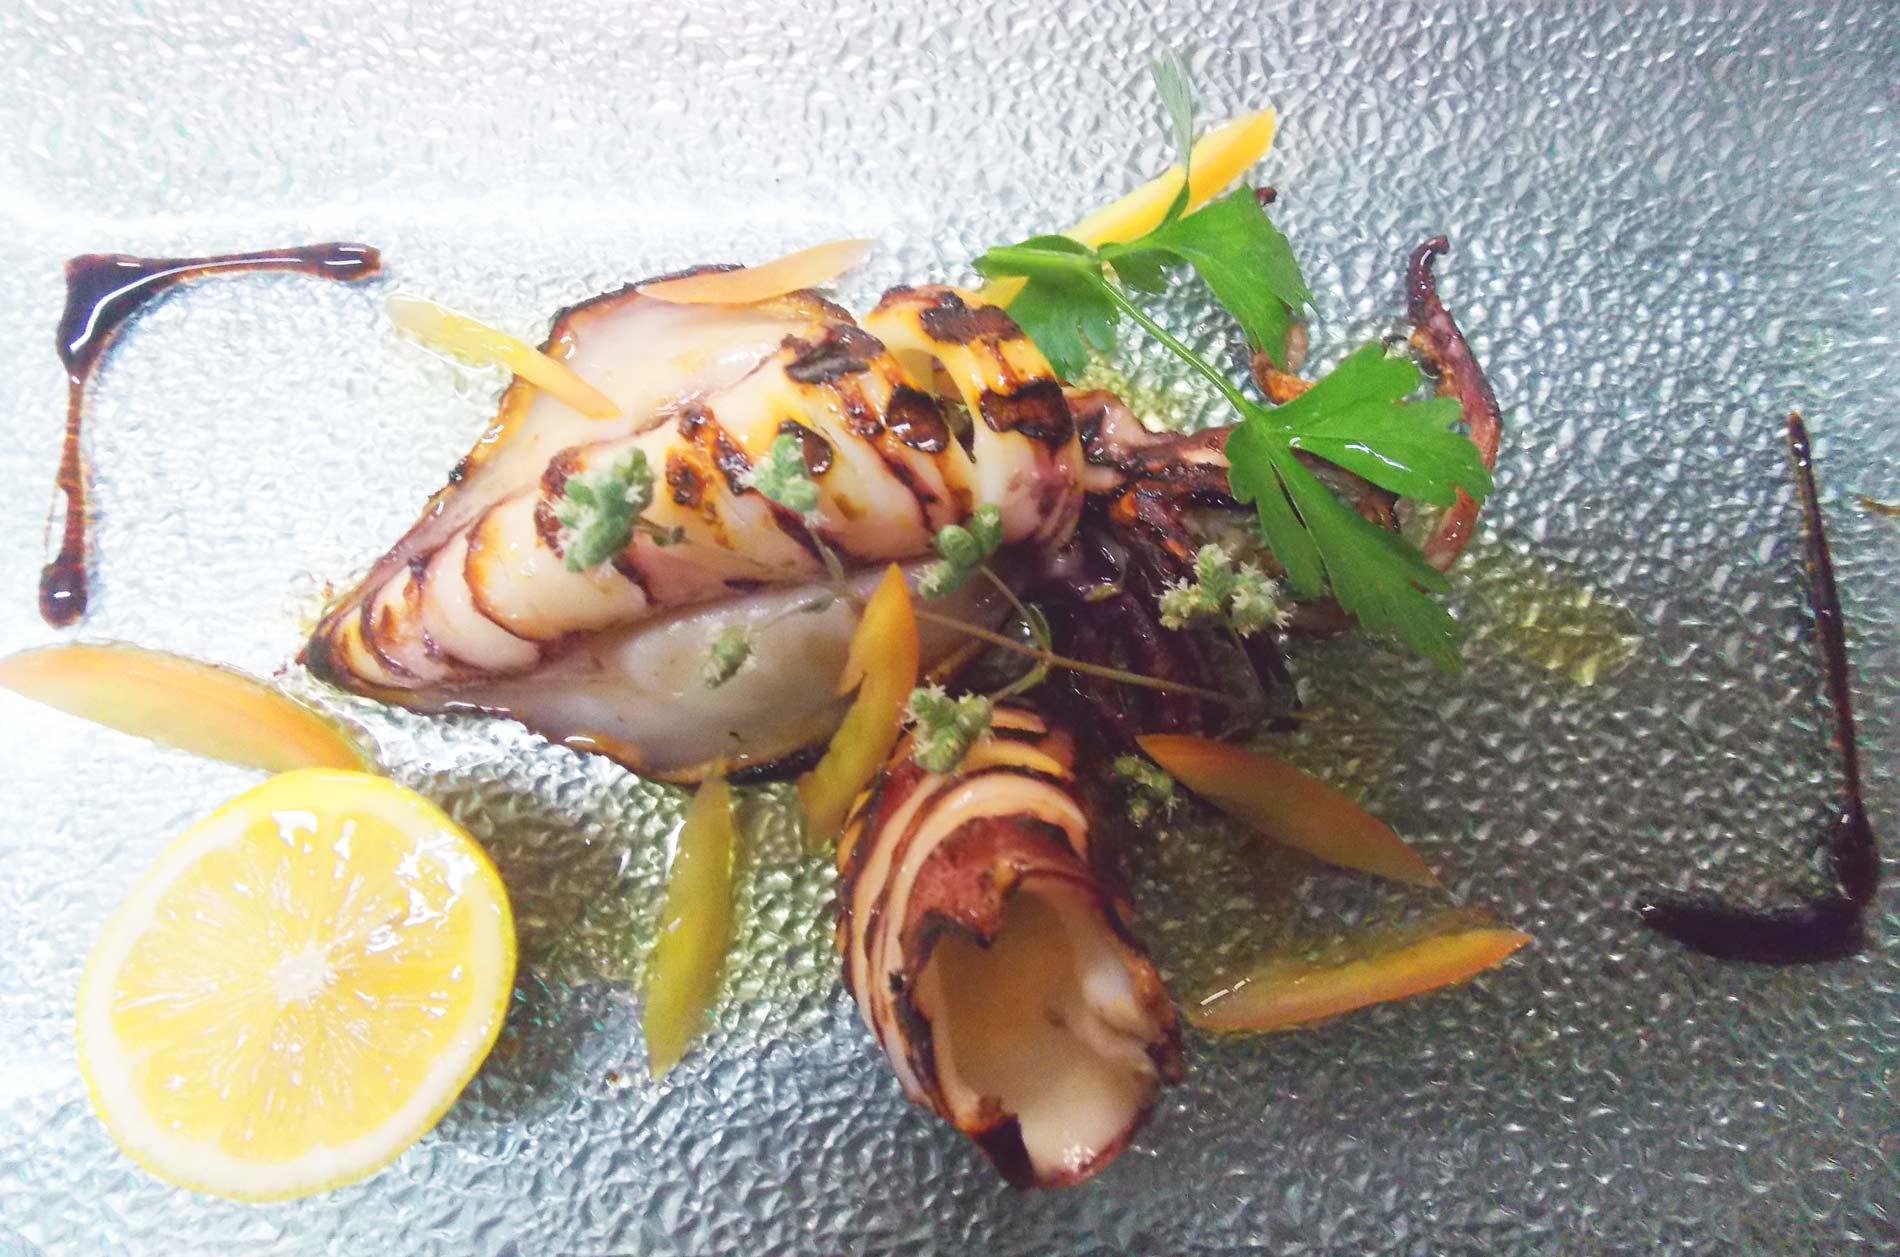 ristorante-pizzeria-La-Perla-Rosa-Sassari-gamberi-e-calamari-arrosto.jpg-3